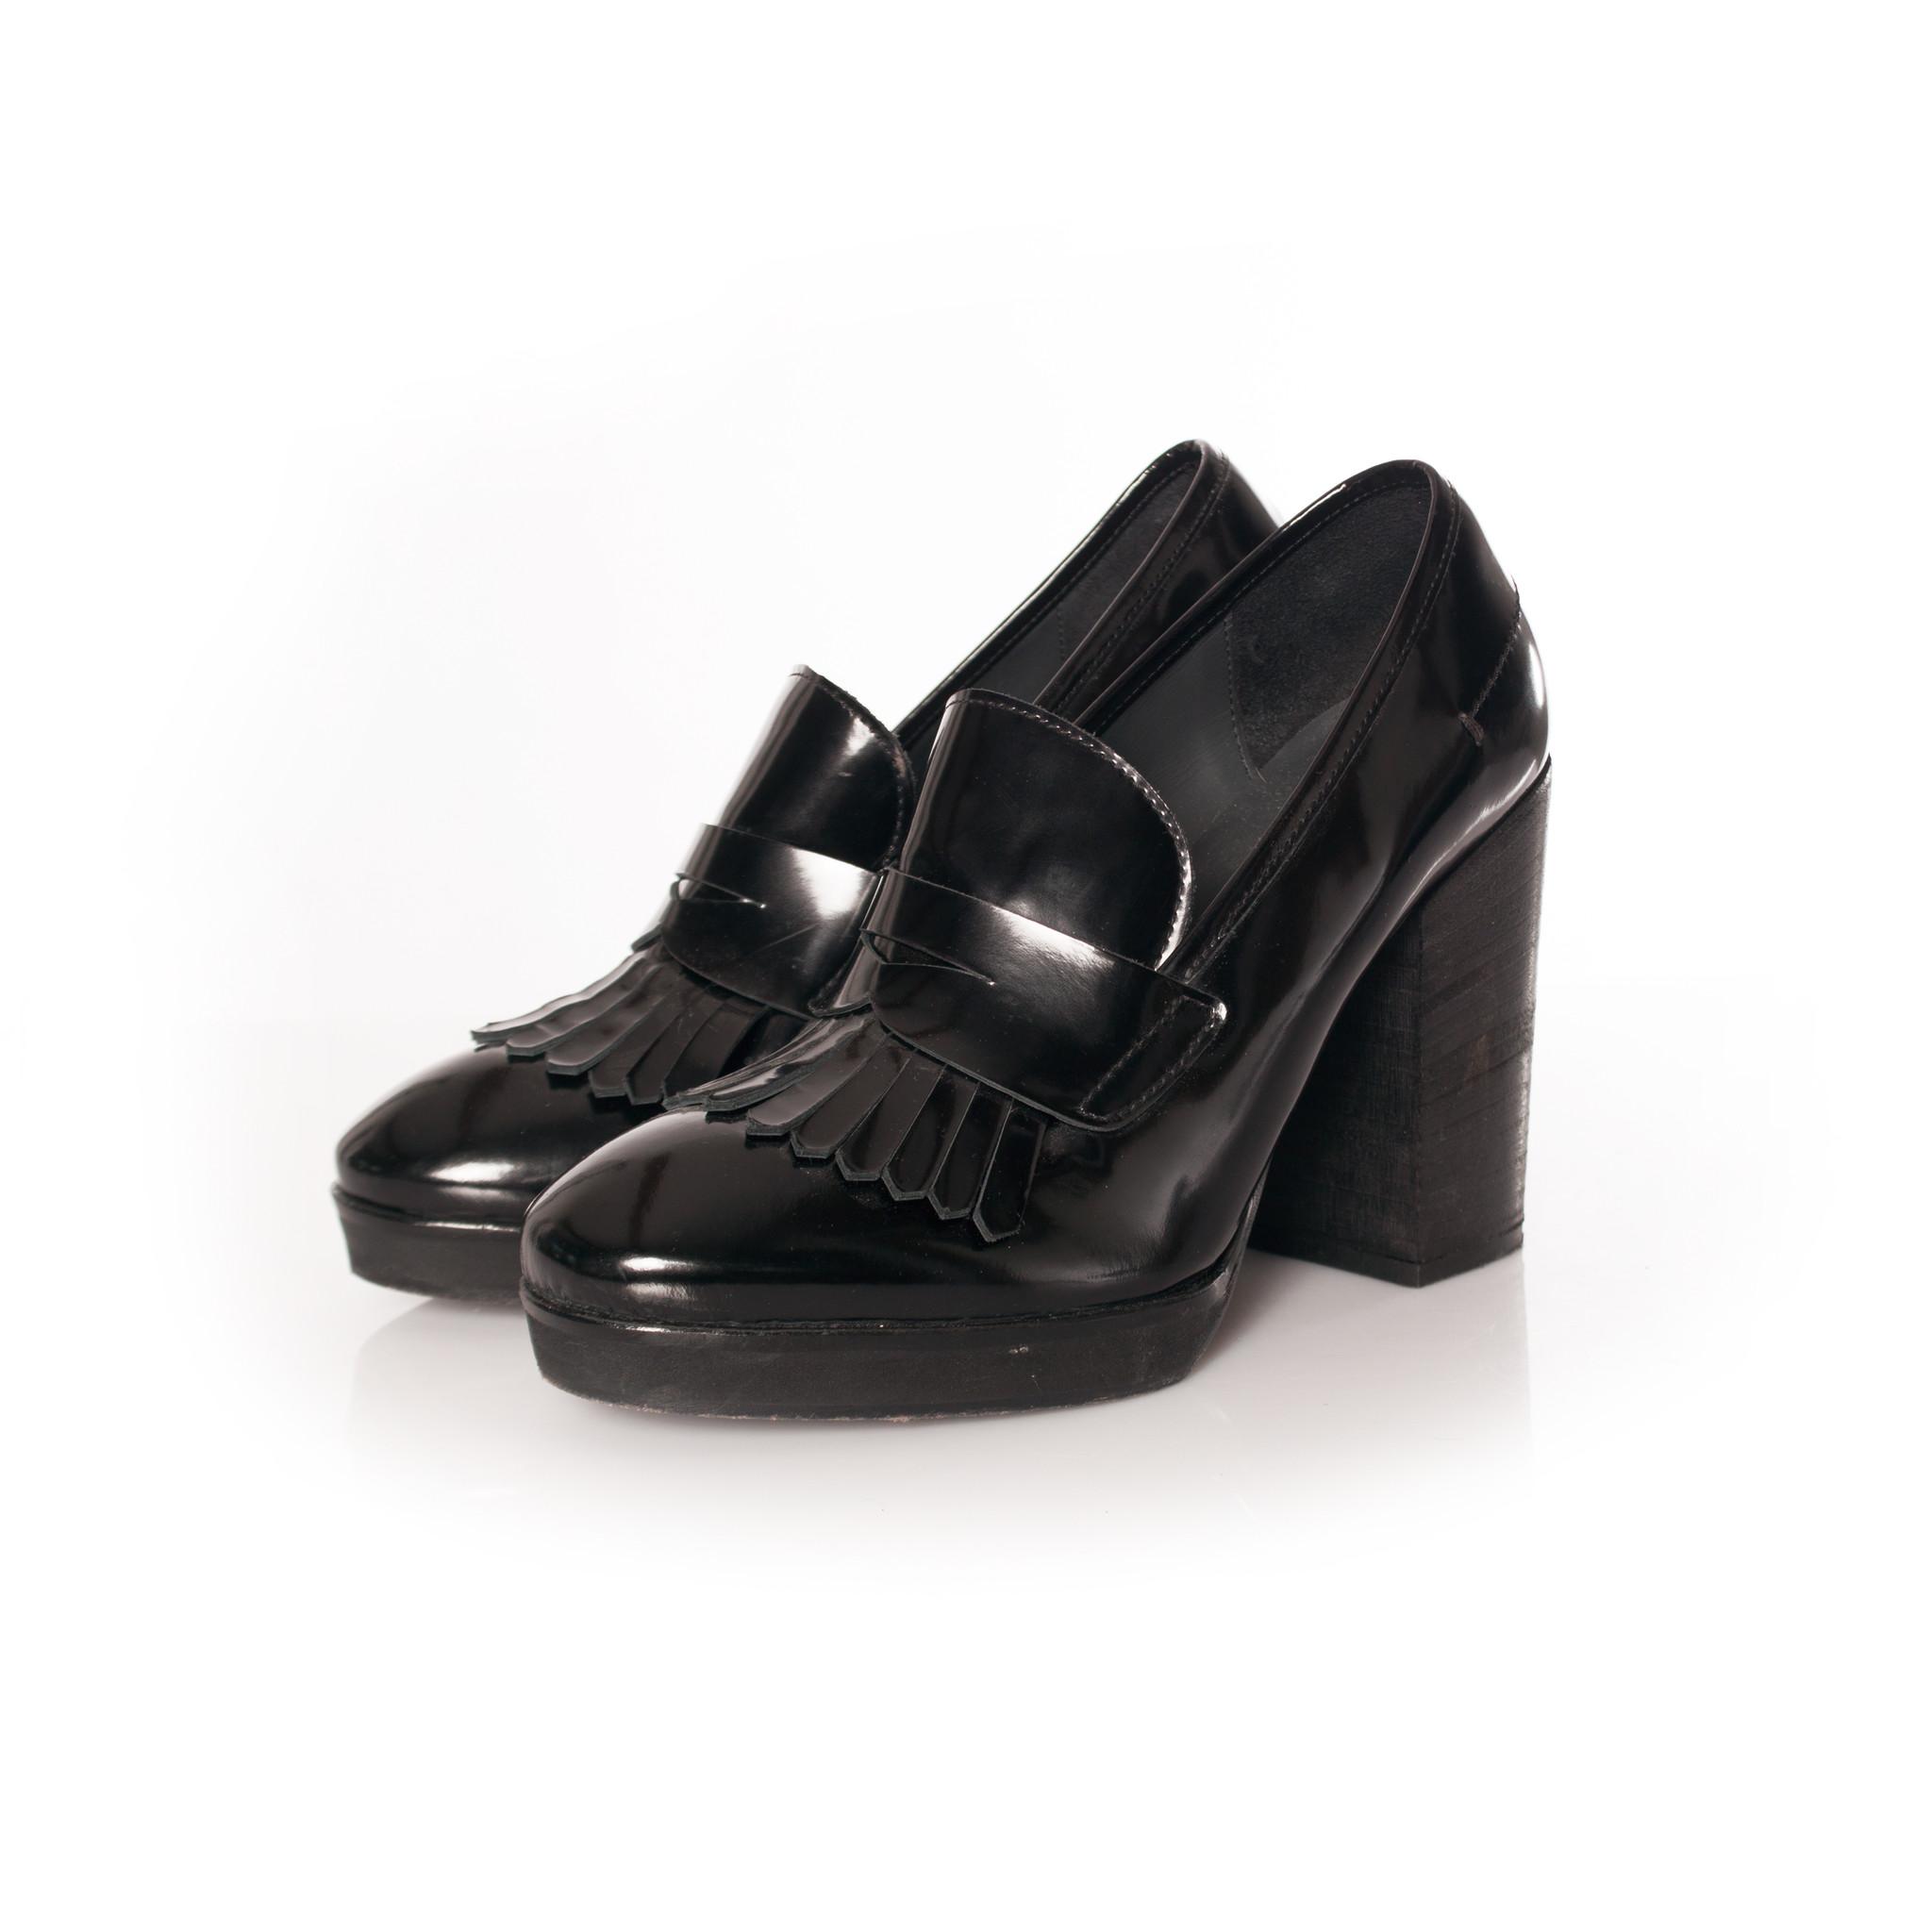 Fiorifrancesi, black patent leather